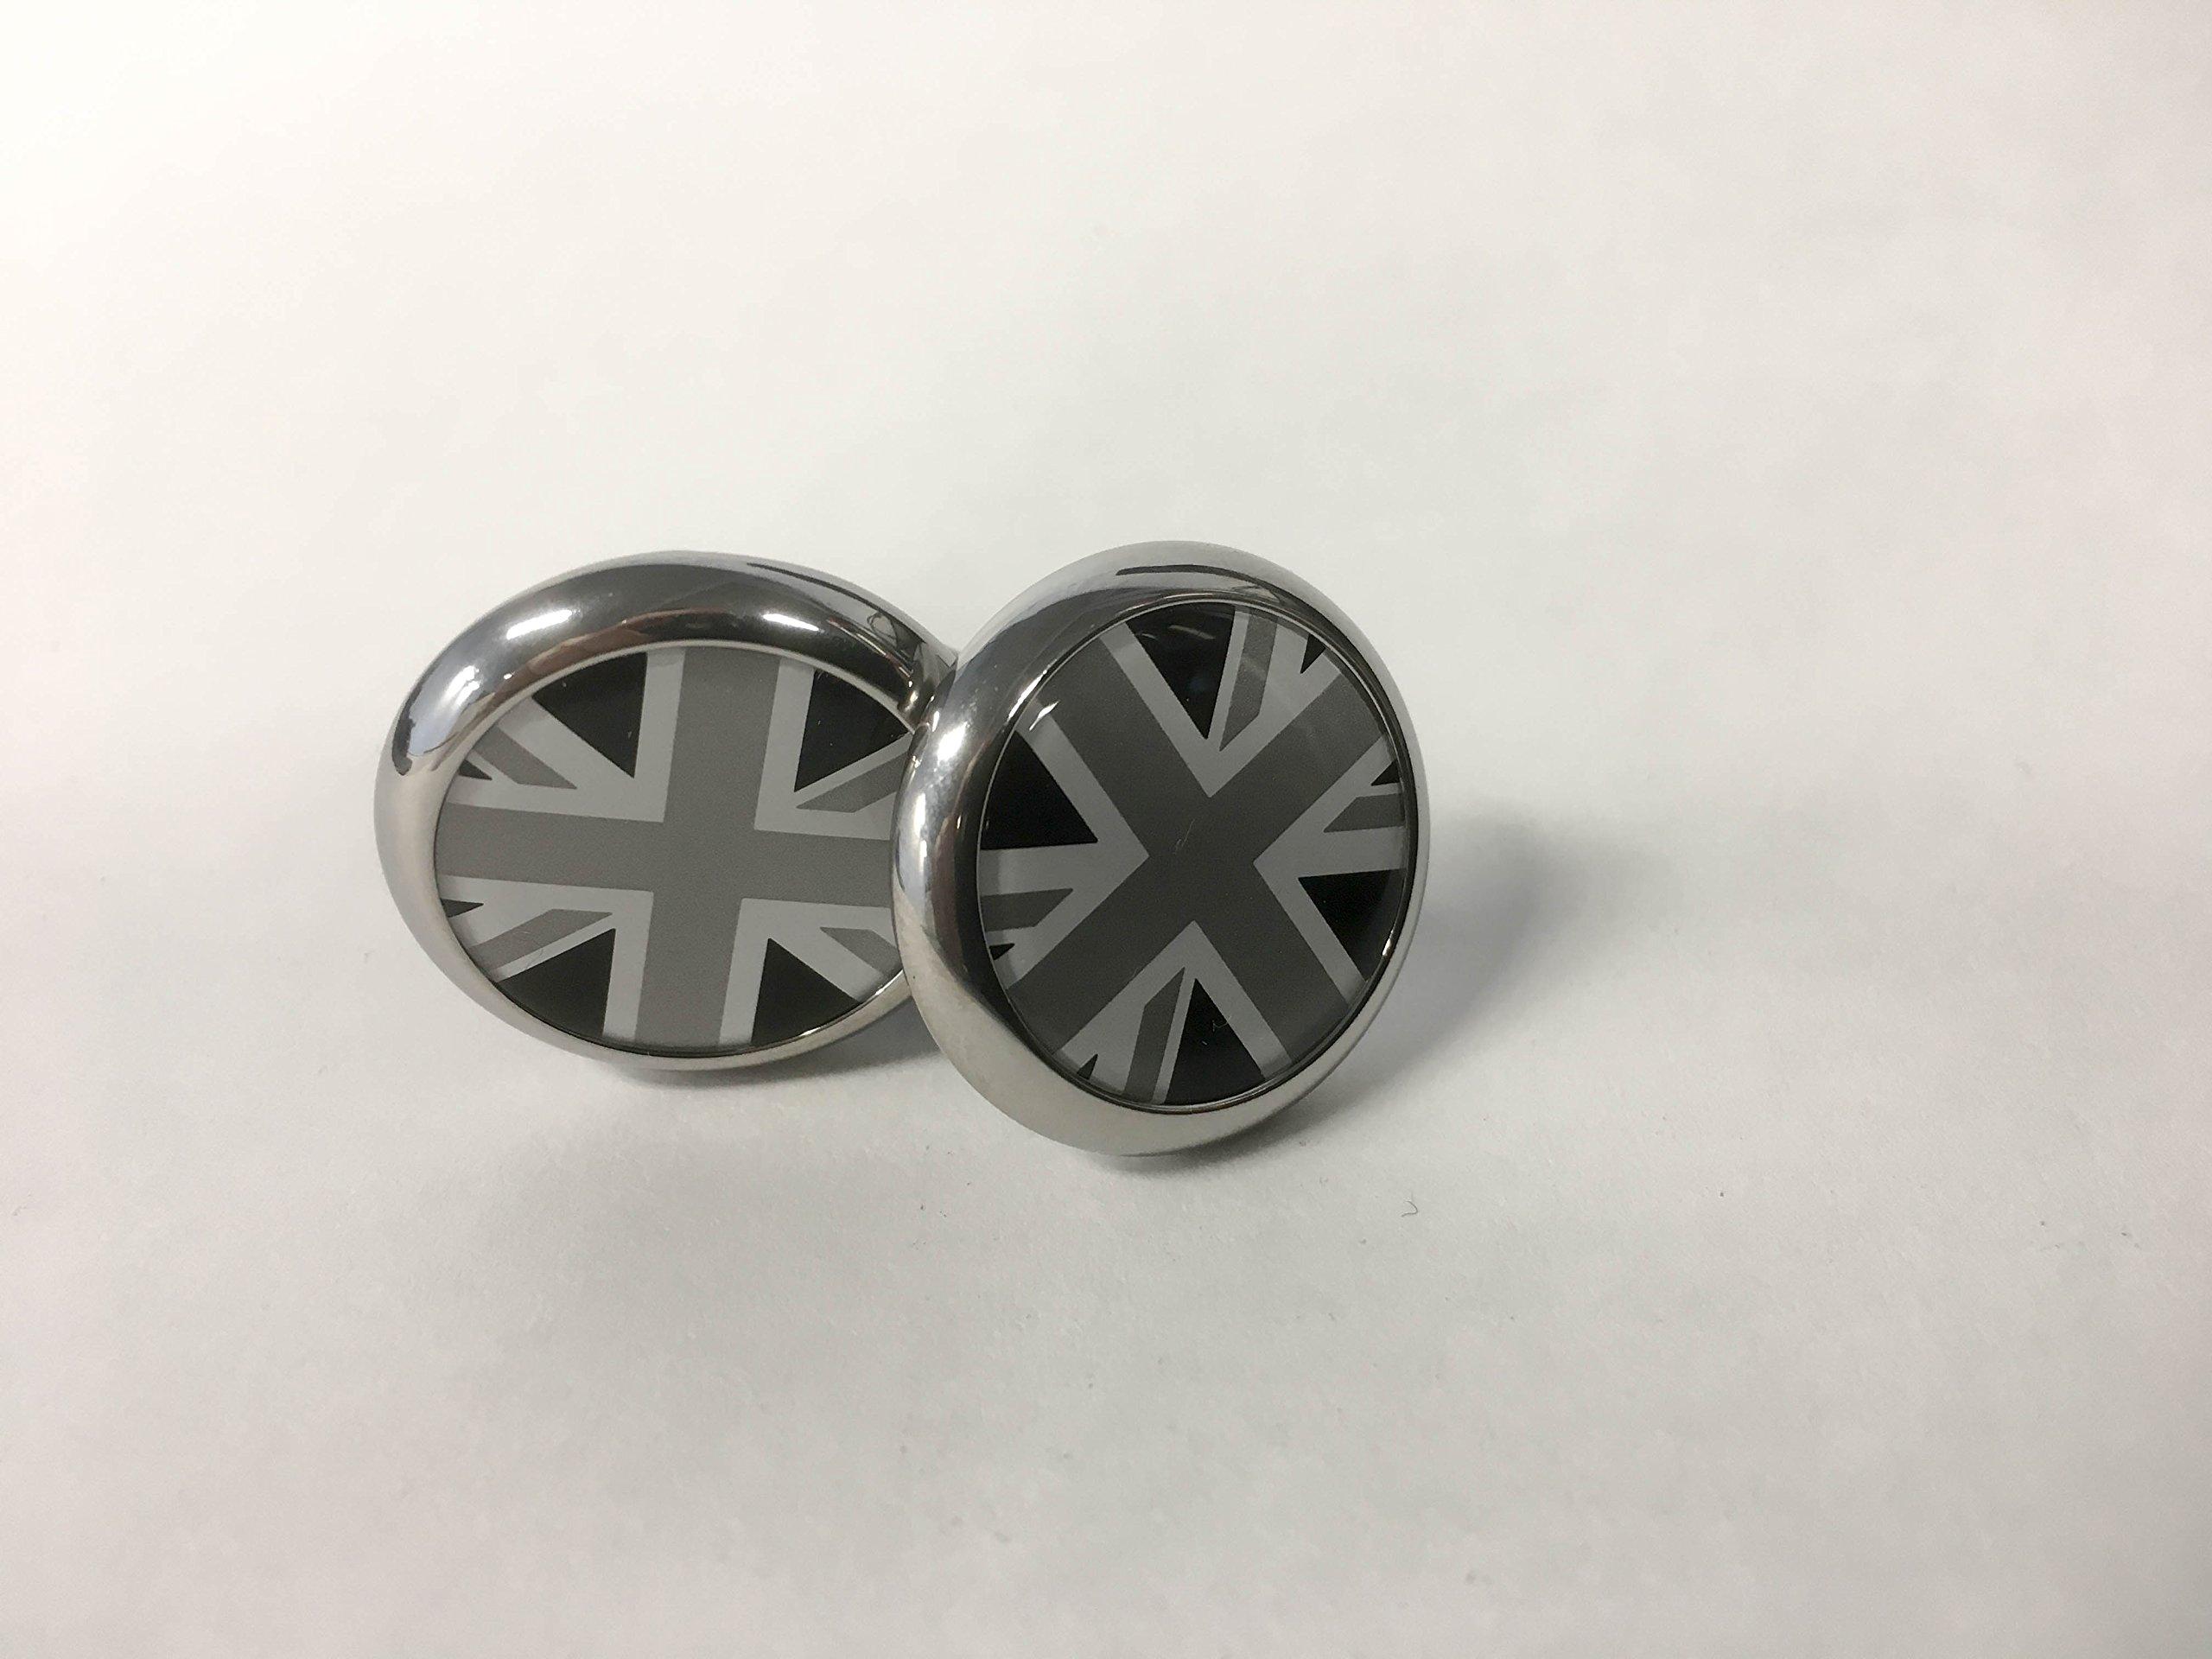 MINI COOPER Door Lock Caps/ Black Jack, 2 caps per box